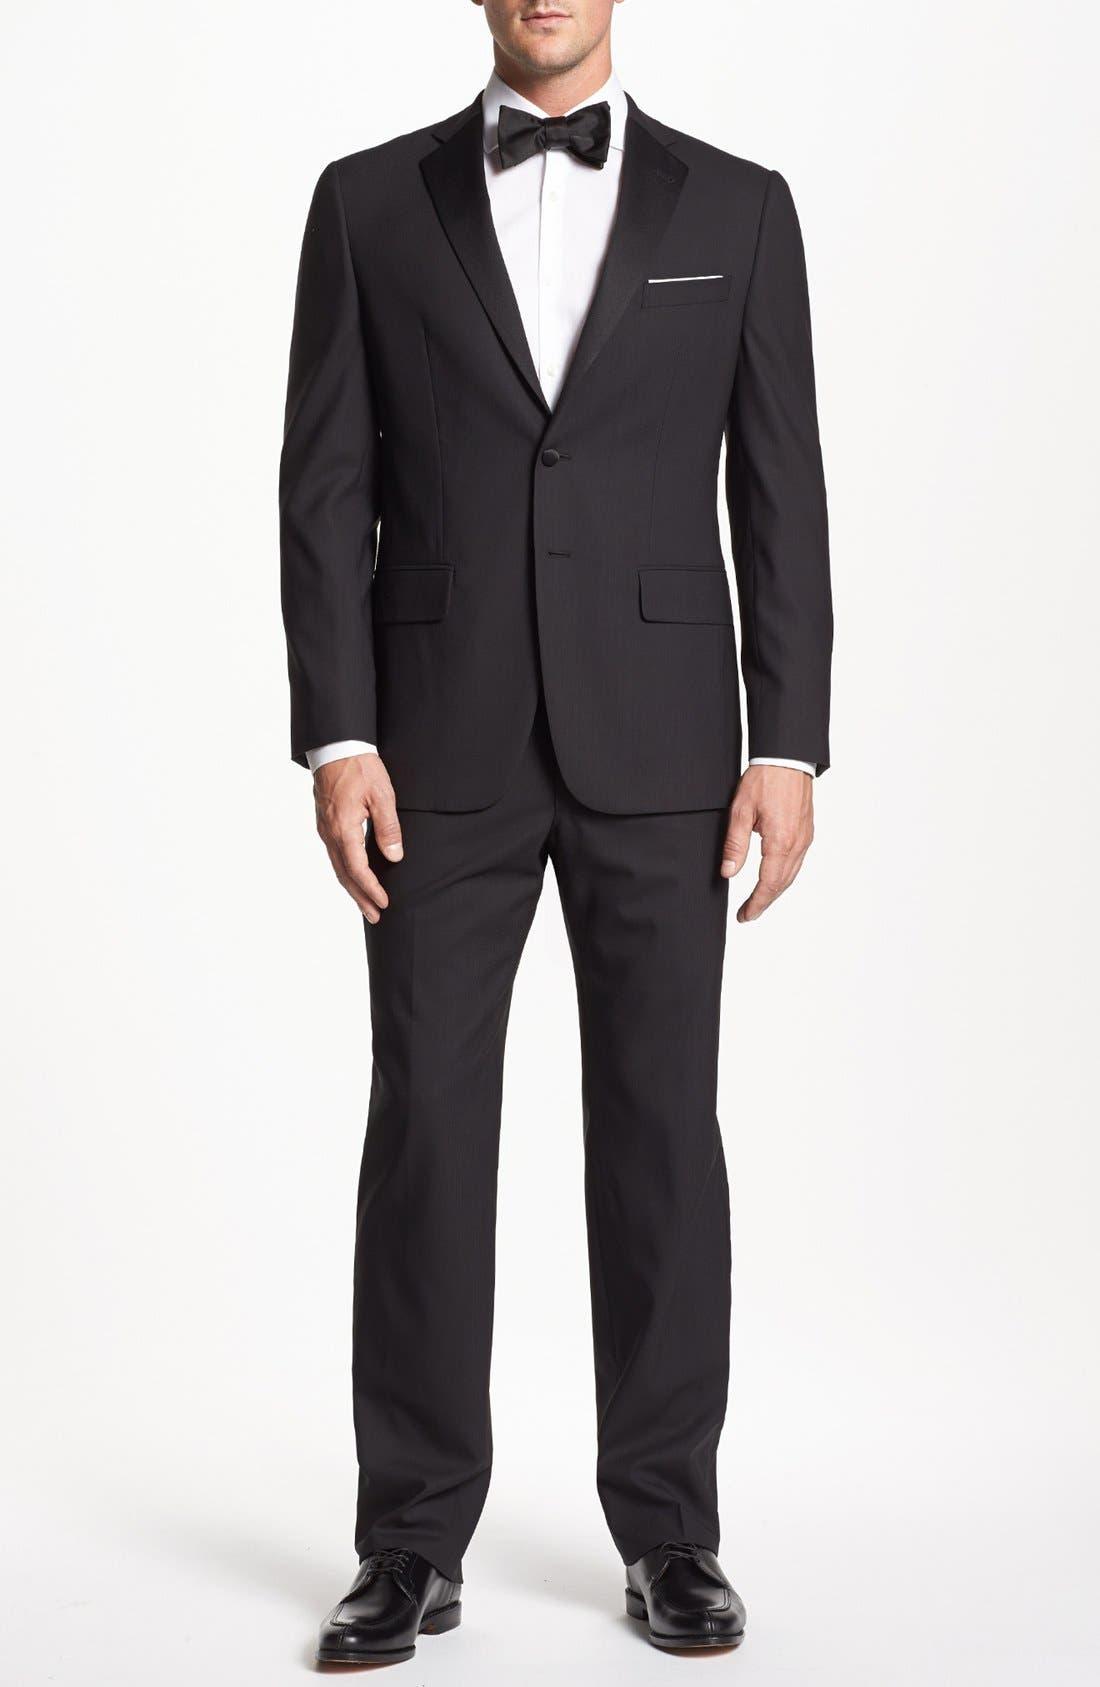 Main Image - Joseph Abboud 'Profile Hybrid' Trim Fit Wool Tuxedo (Online Only)